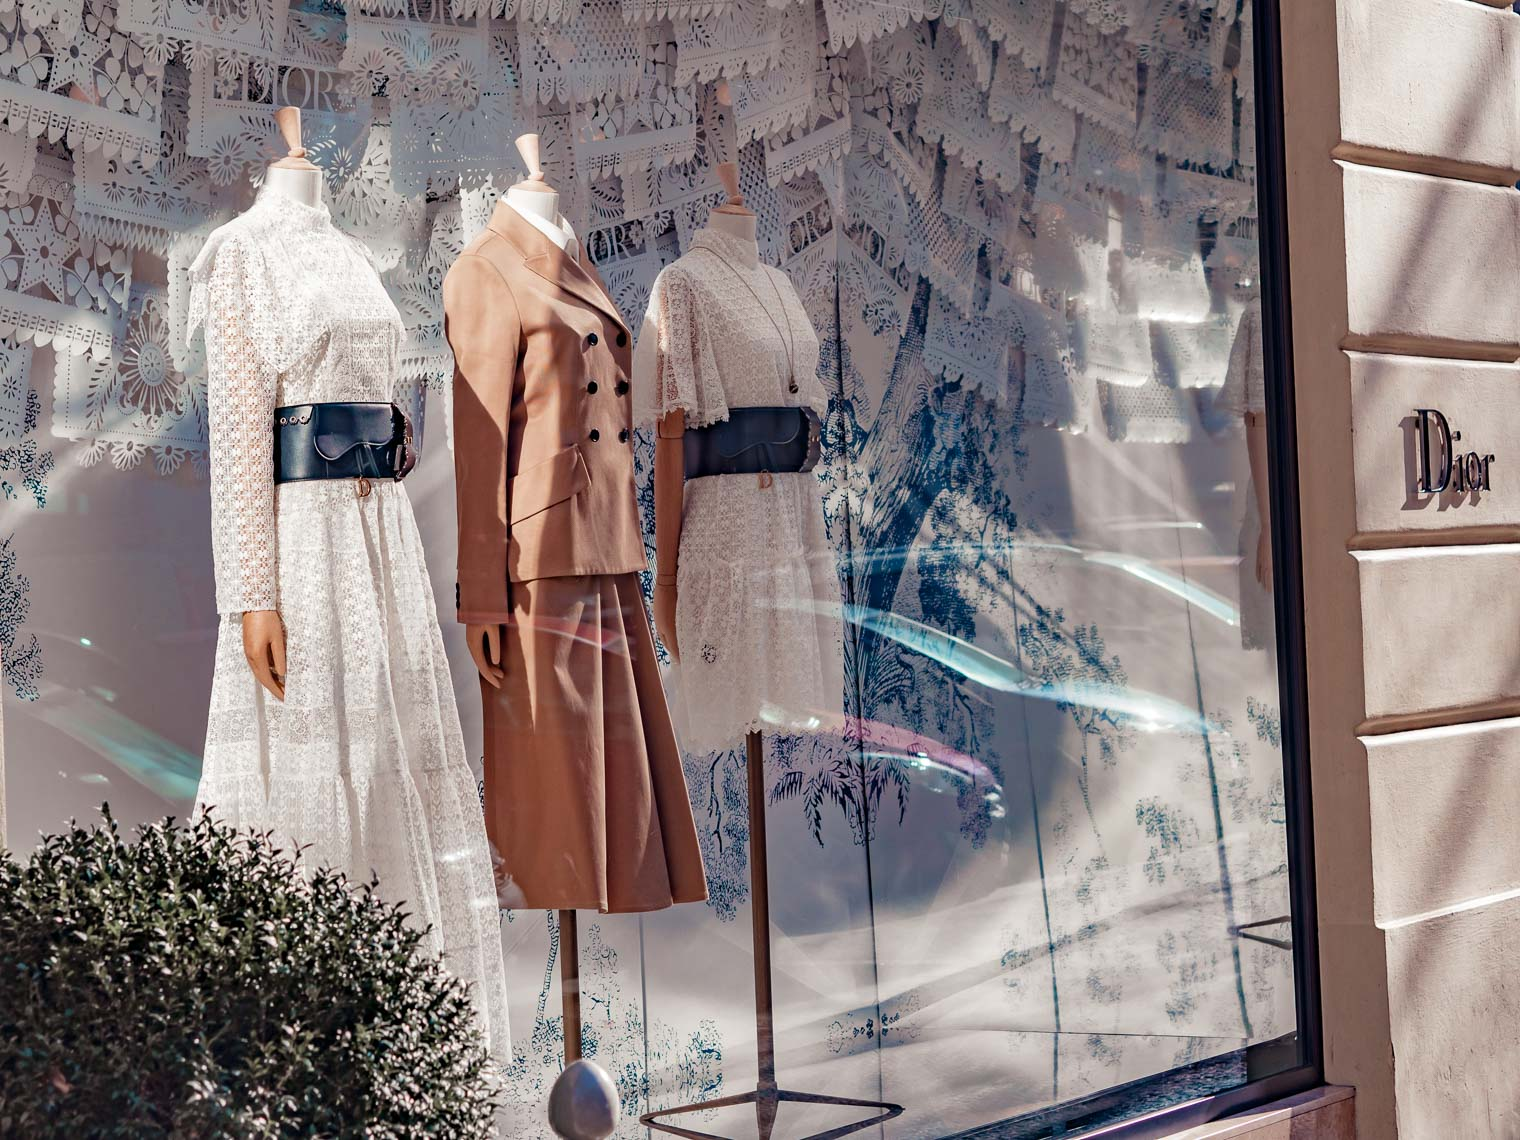 Dior shop in Prague Parizska street